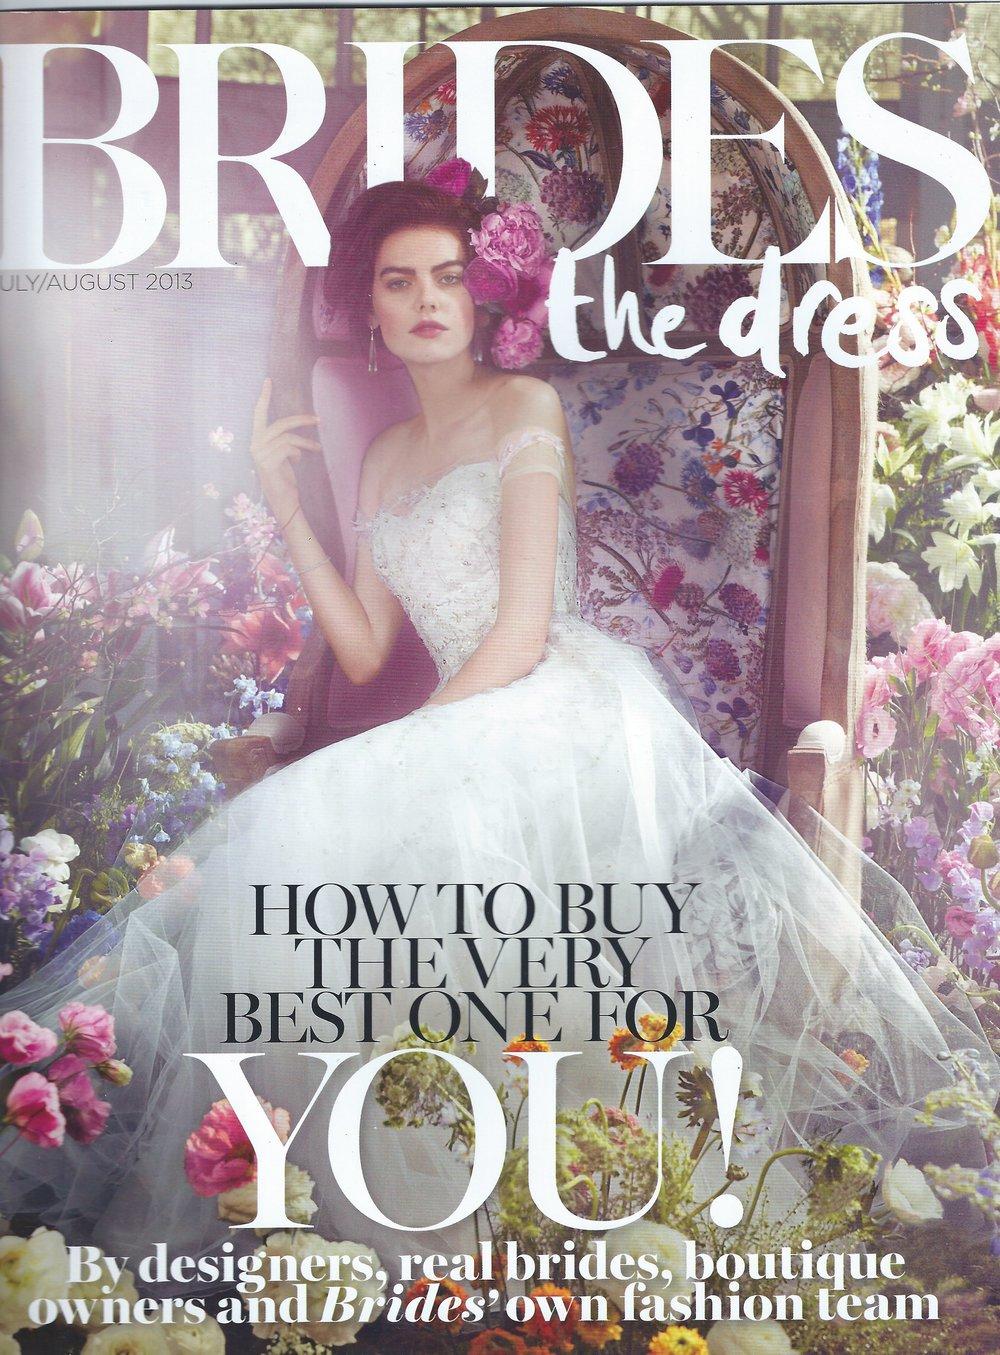 3A.BRIDES THE DRESS.JPG